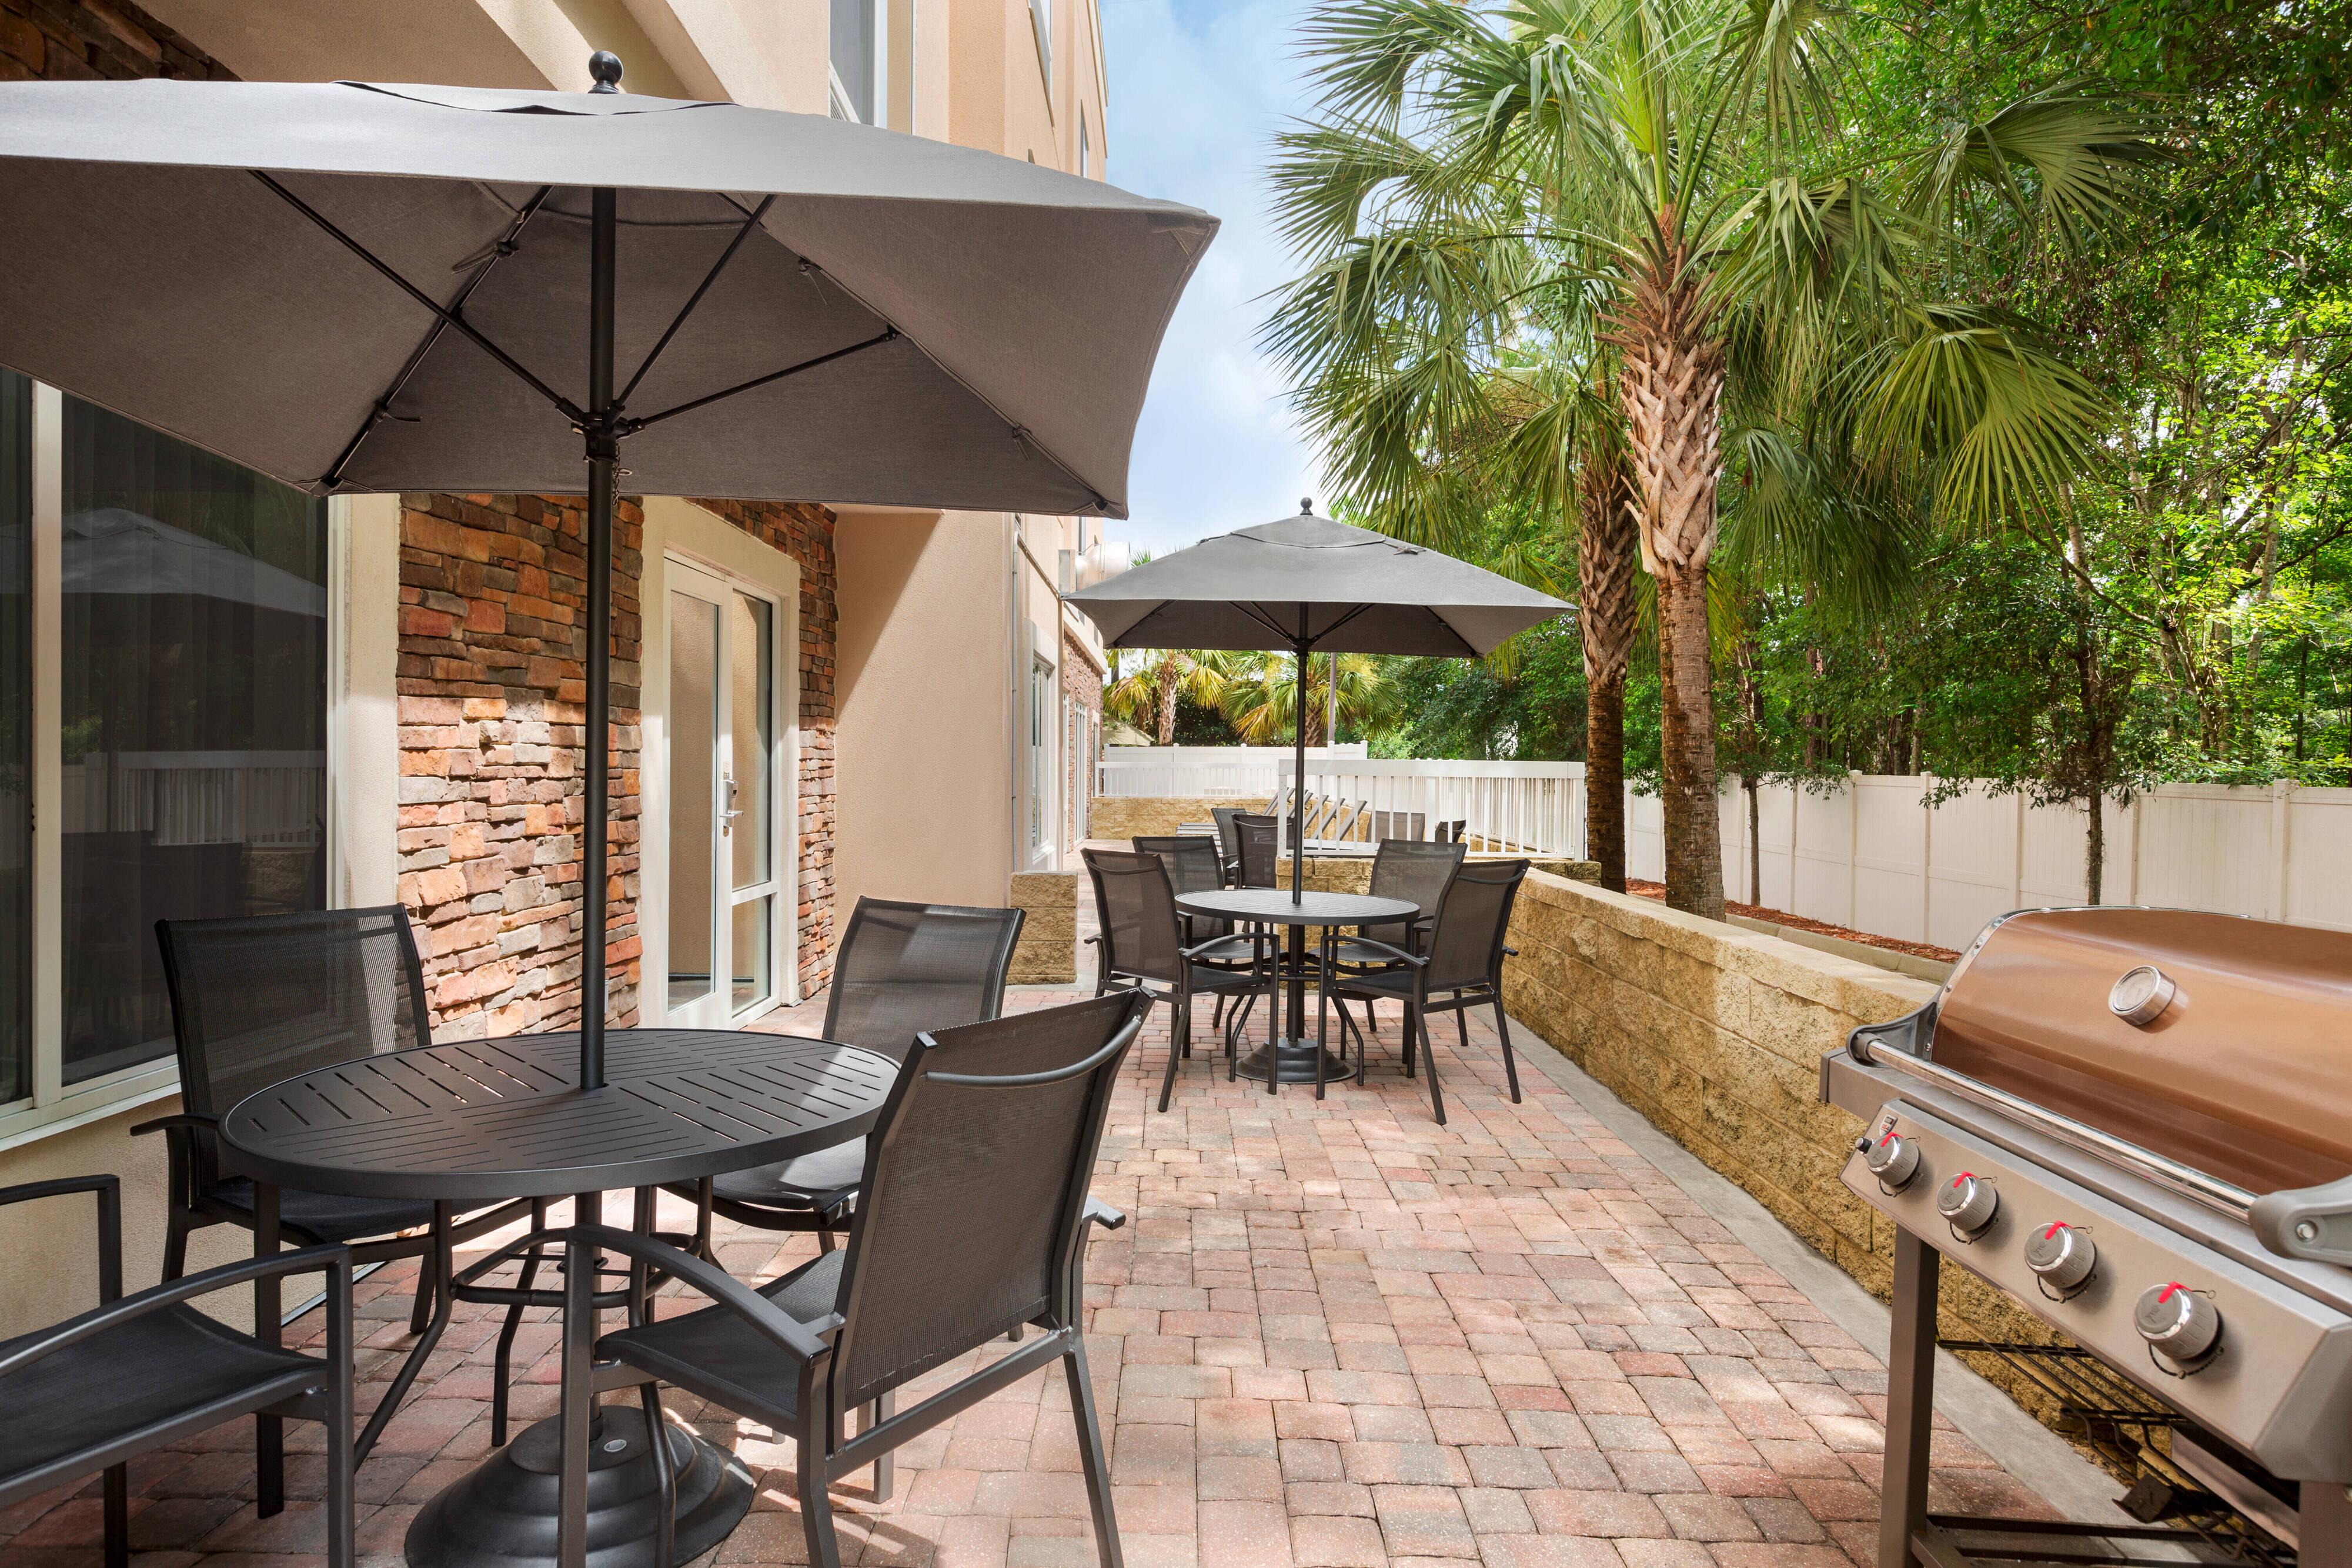 Fairfield Inn & Suites By Marriott Jacksonville West/chaffee